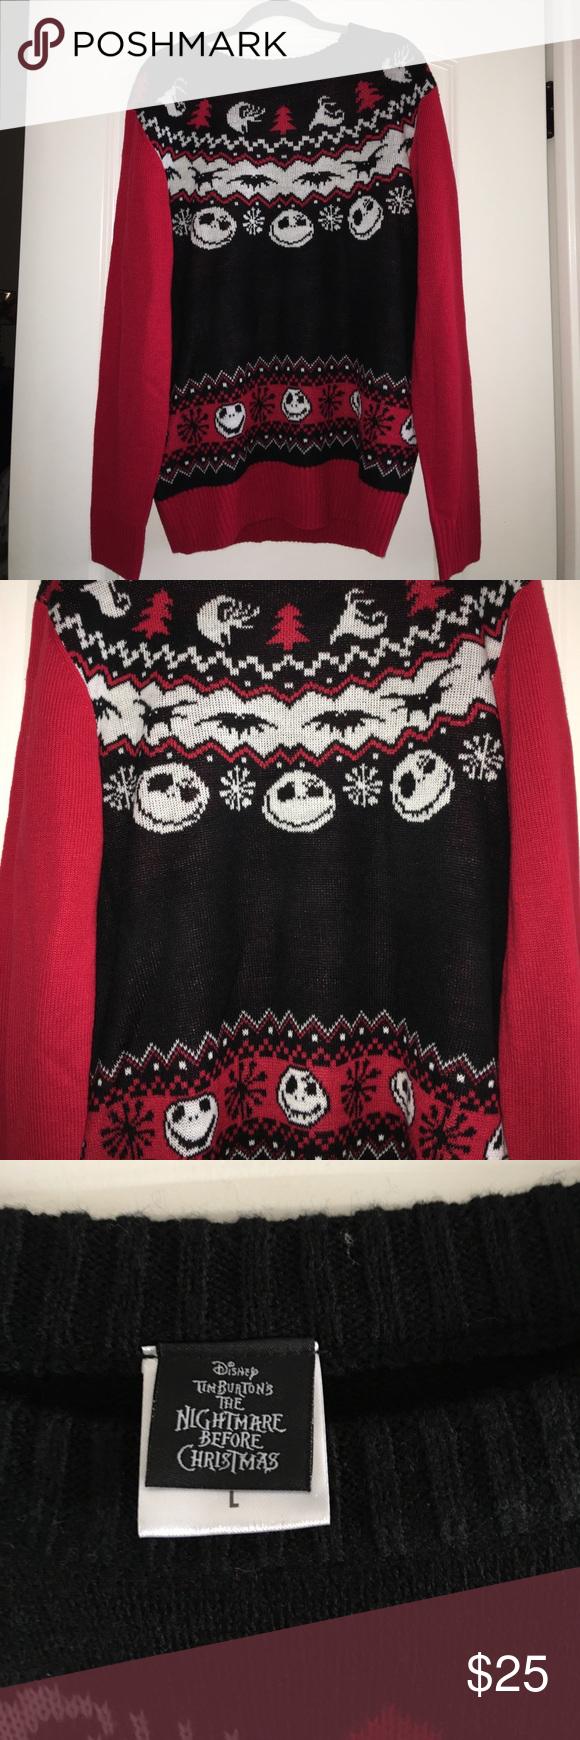 Nightmare Before Christmas Ugly Christmas Sweater My Posh Picks